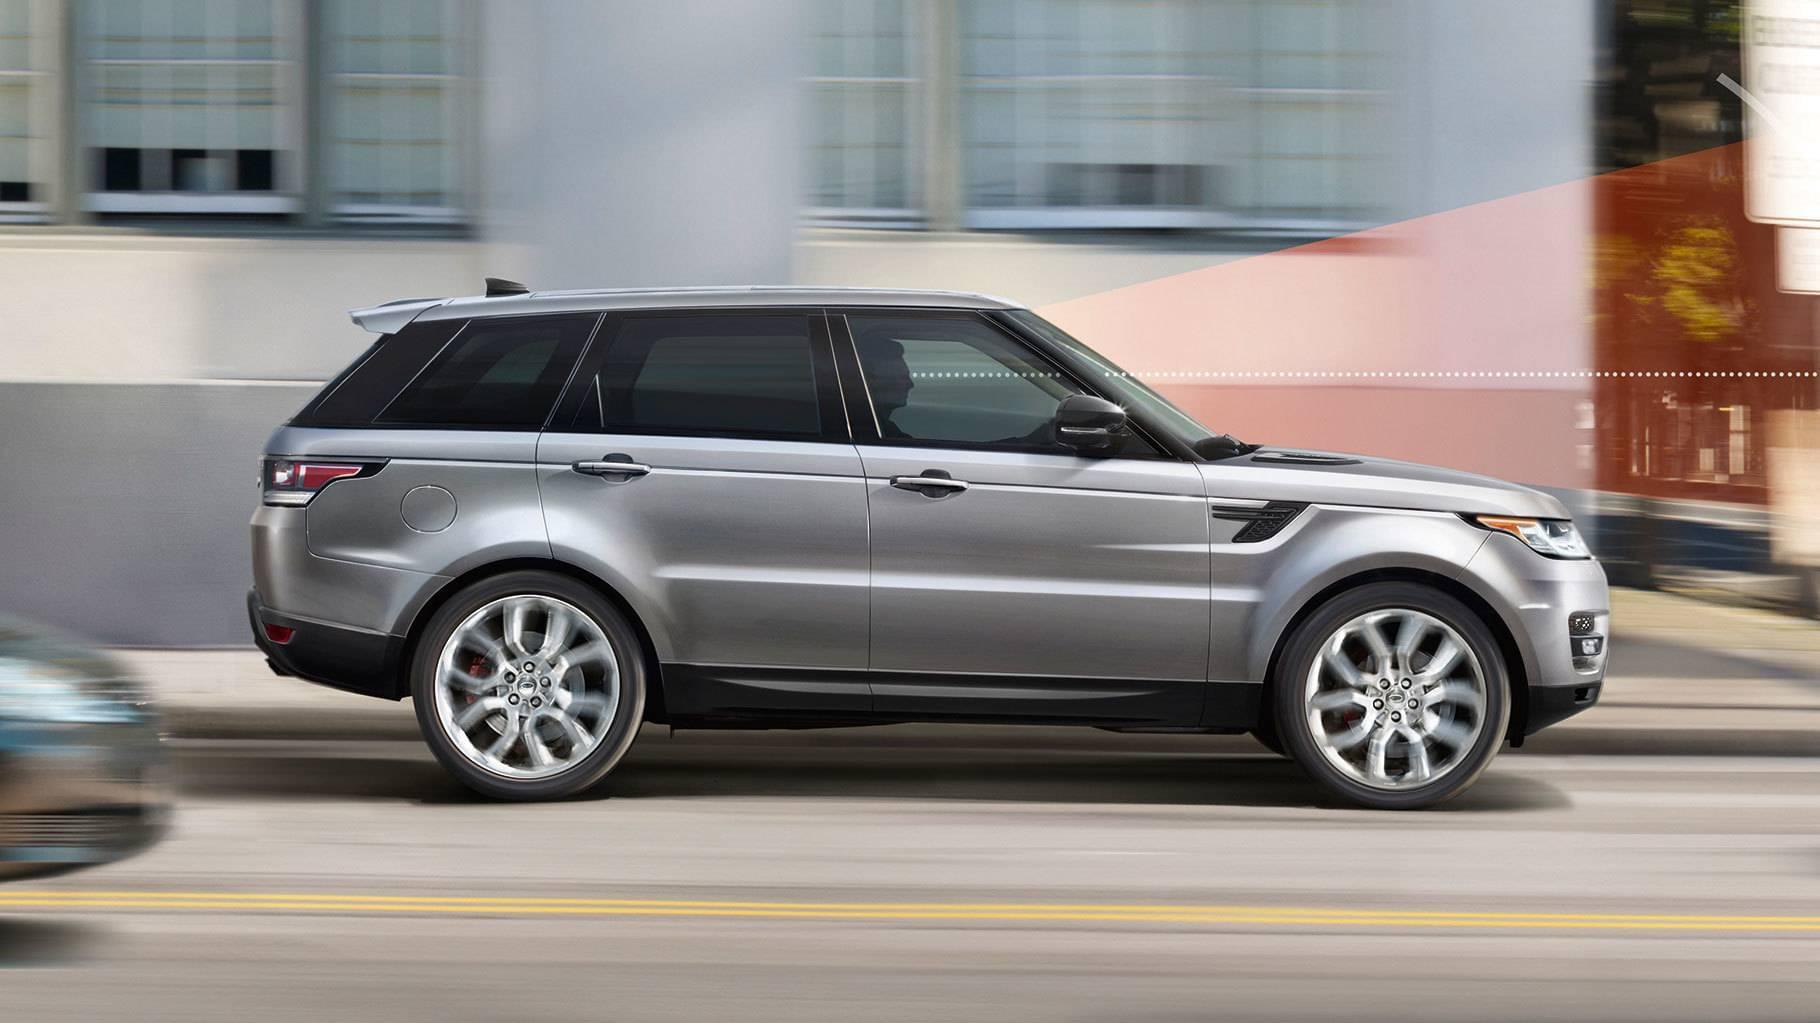 2017 Land Rover Range Rover Sport Exterior profile